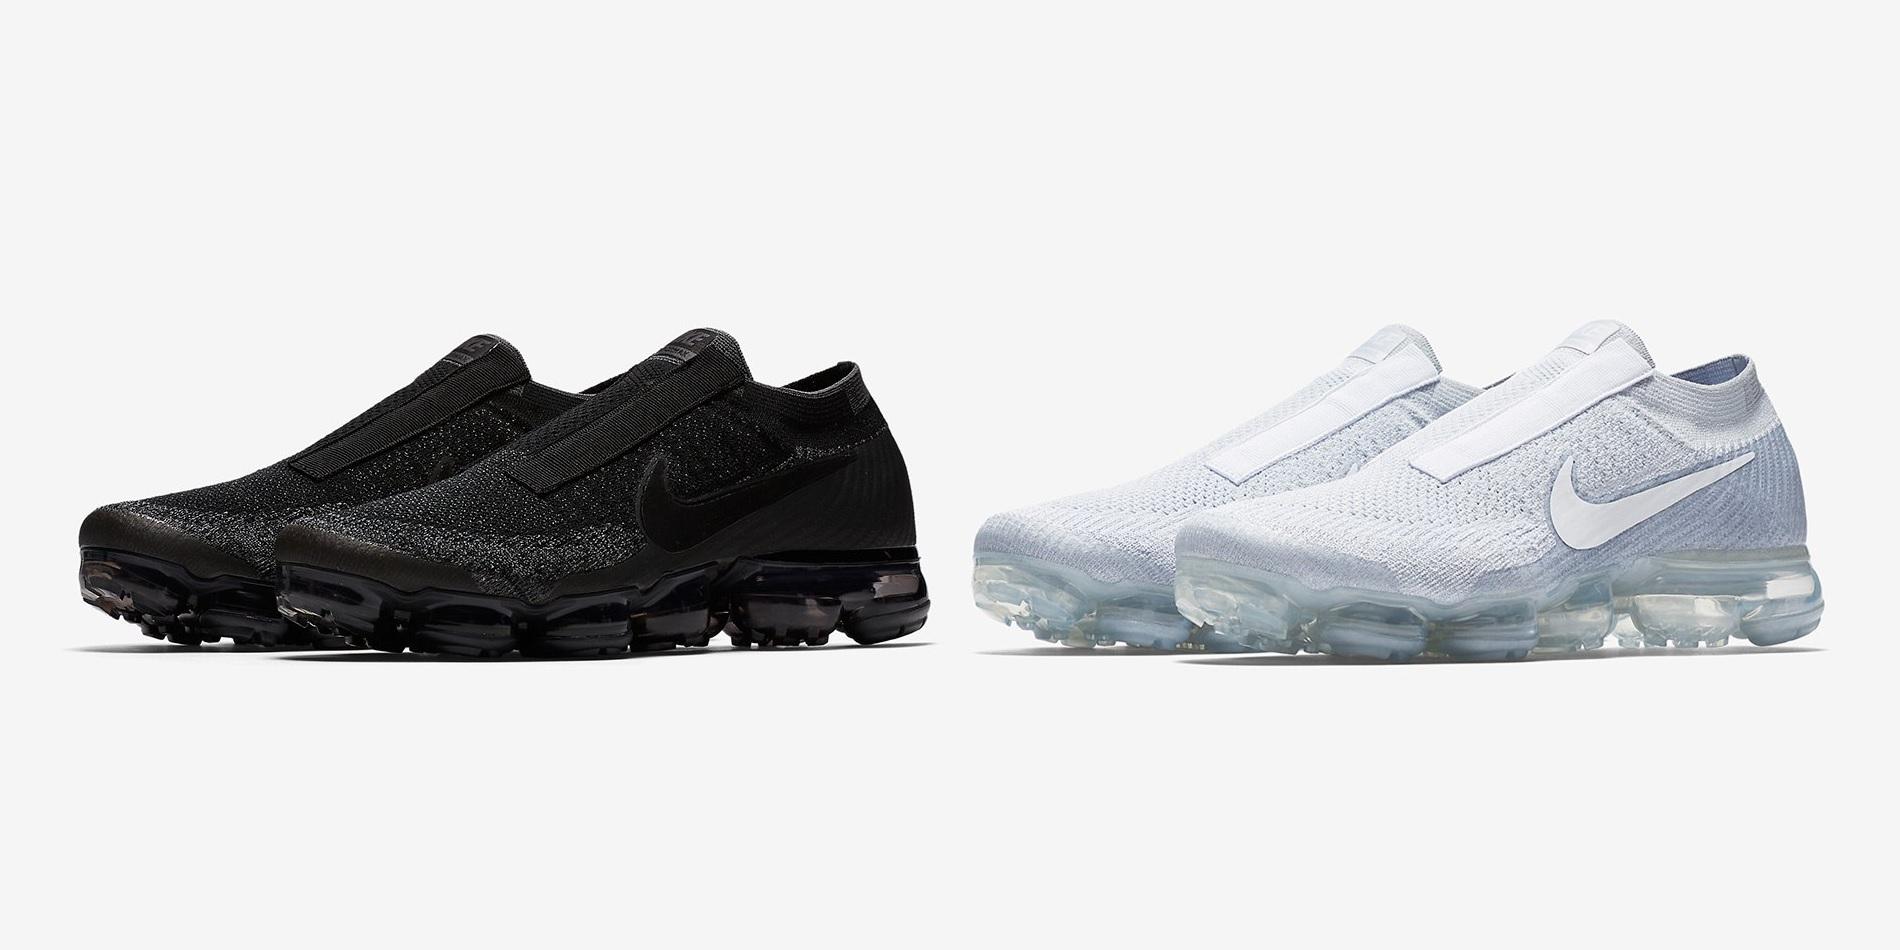 low priced 61969 be1f4 上市速報/ Nike Air VaporMax Flyknit SE 經銷商販售資訊整理 ...